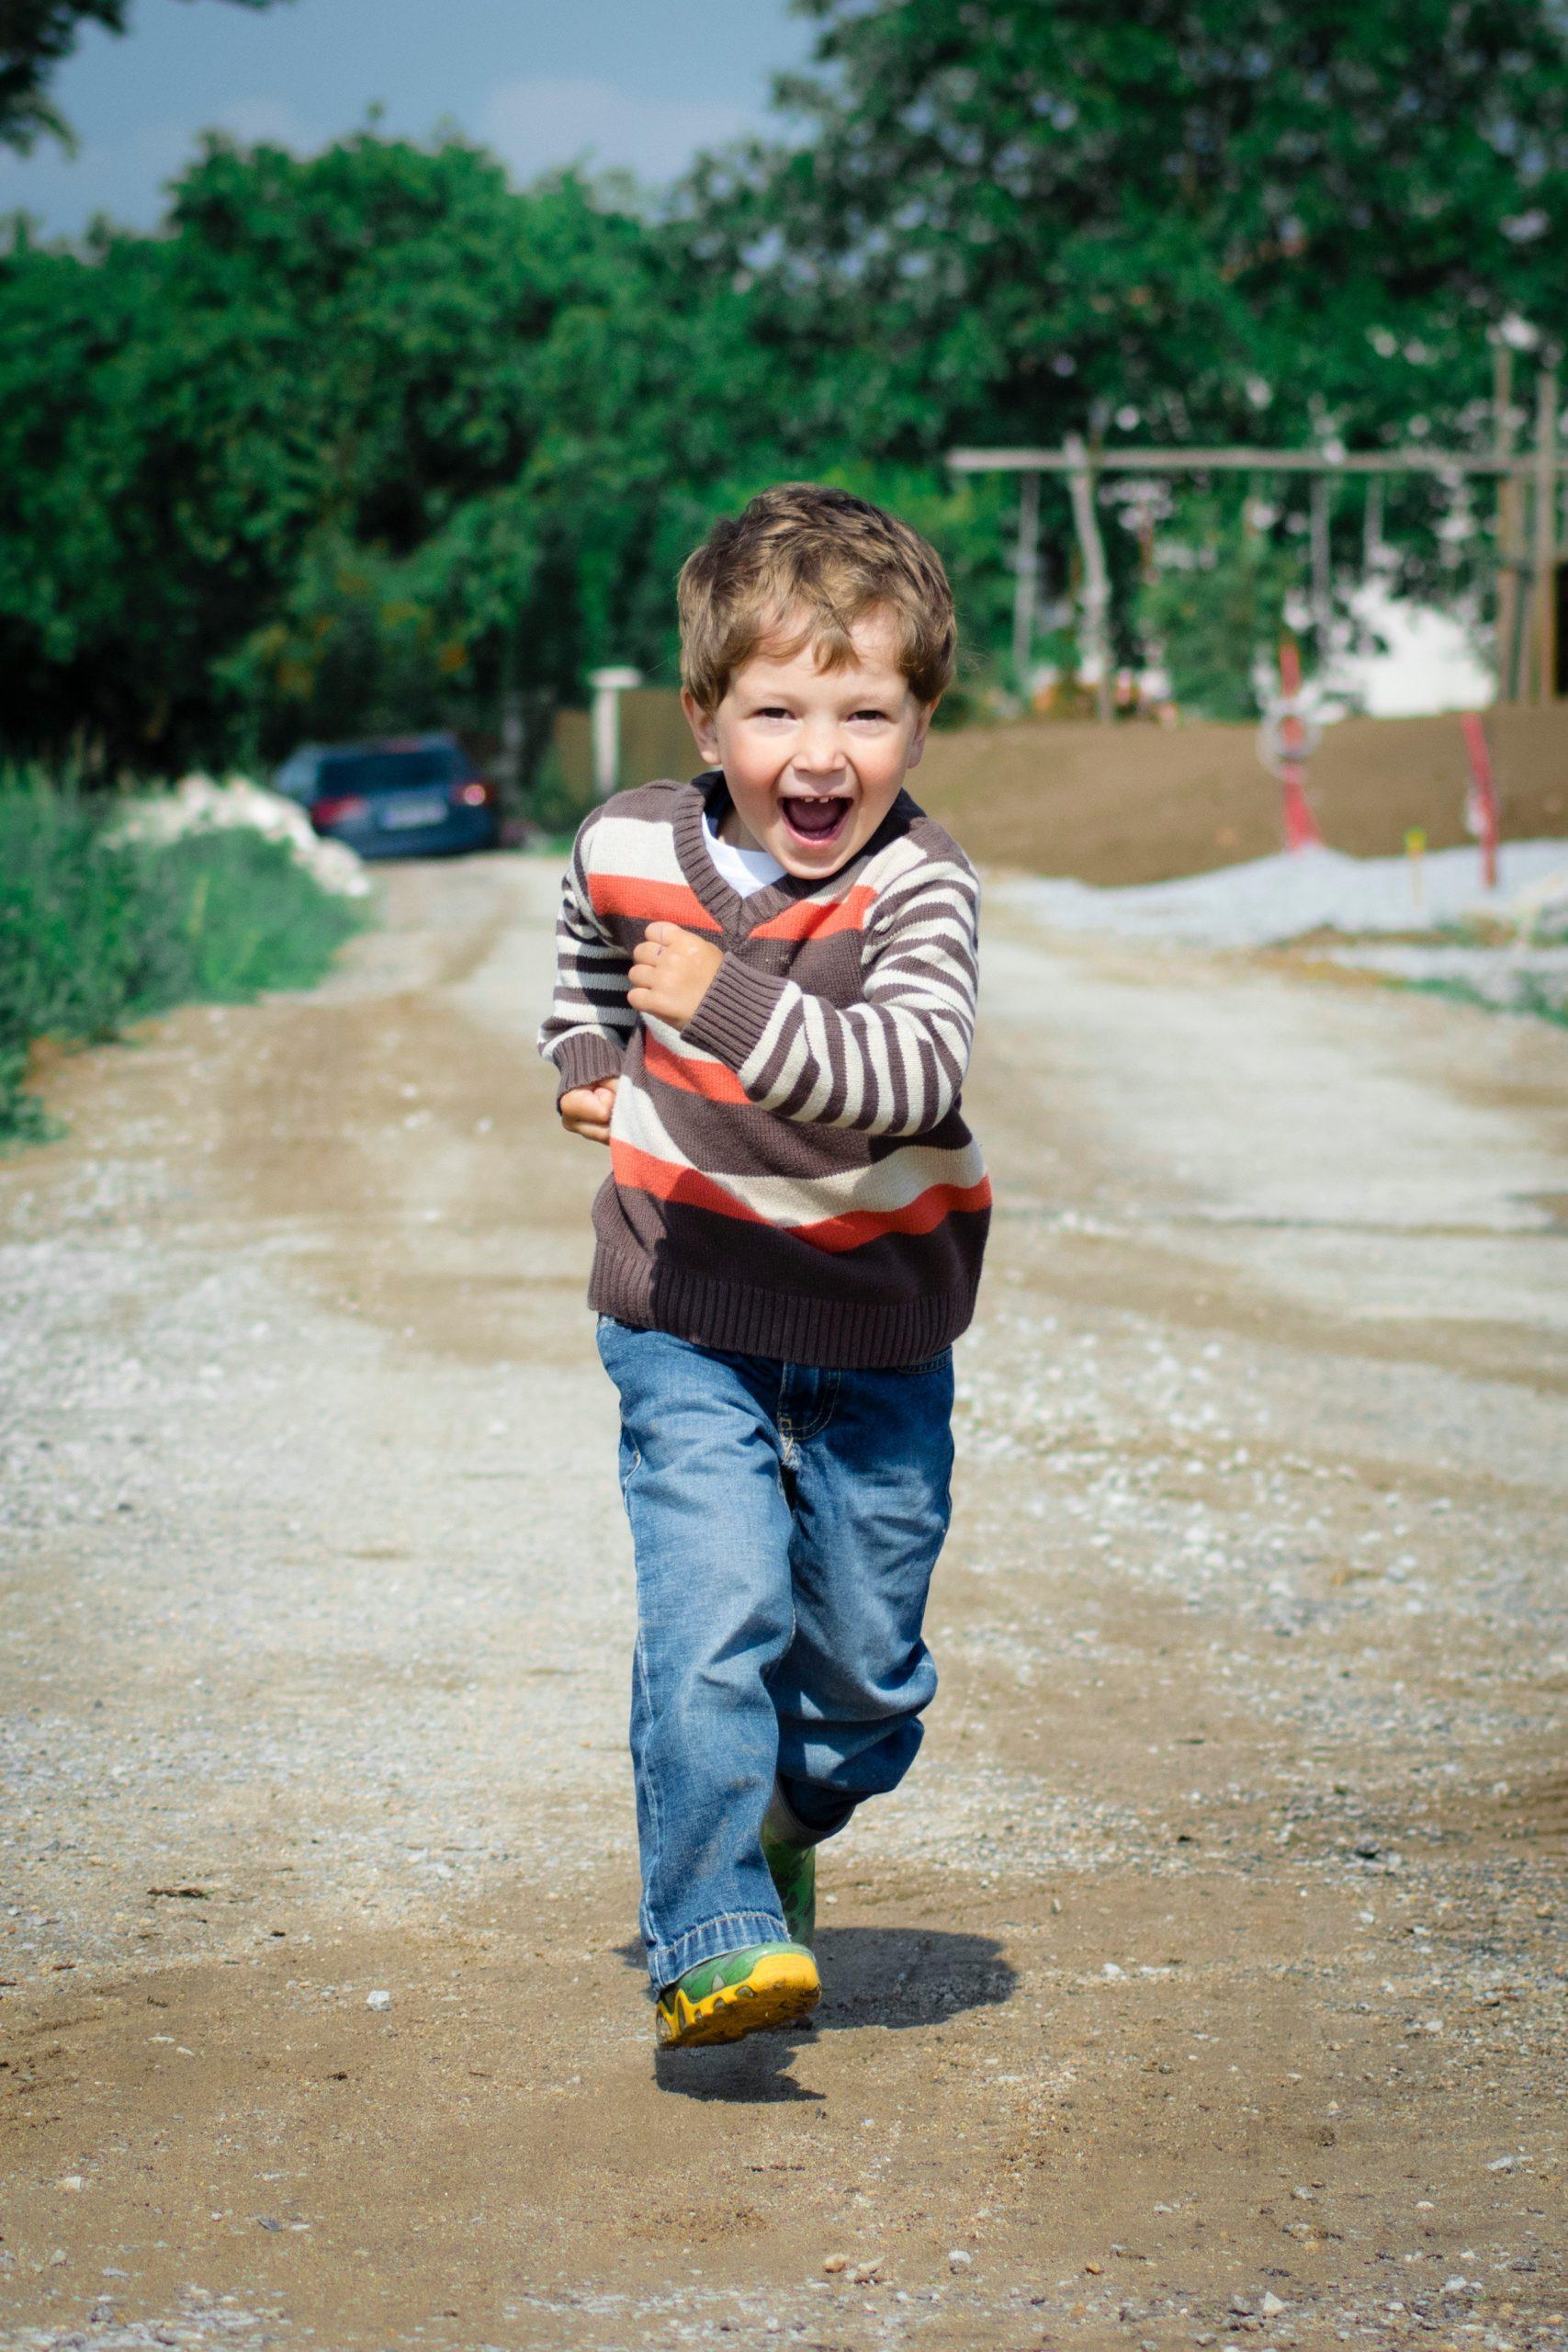 Youth boy running